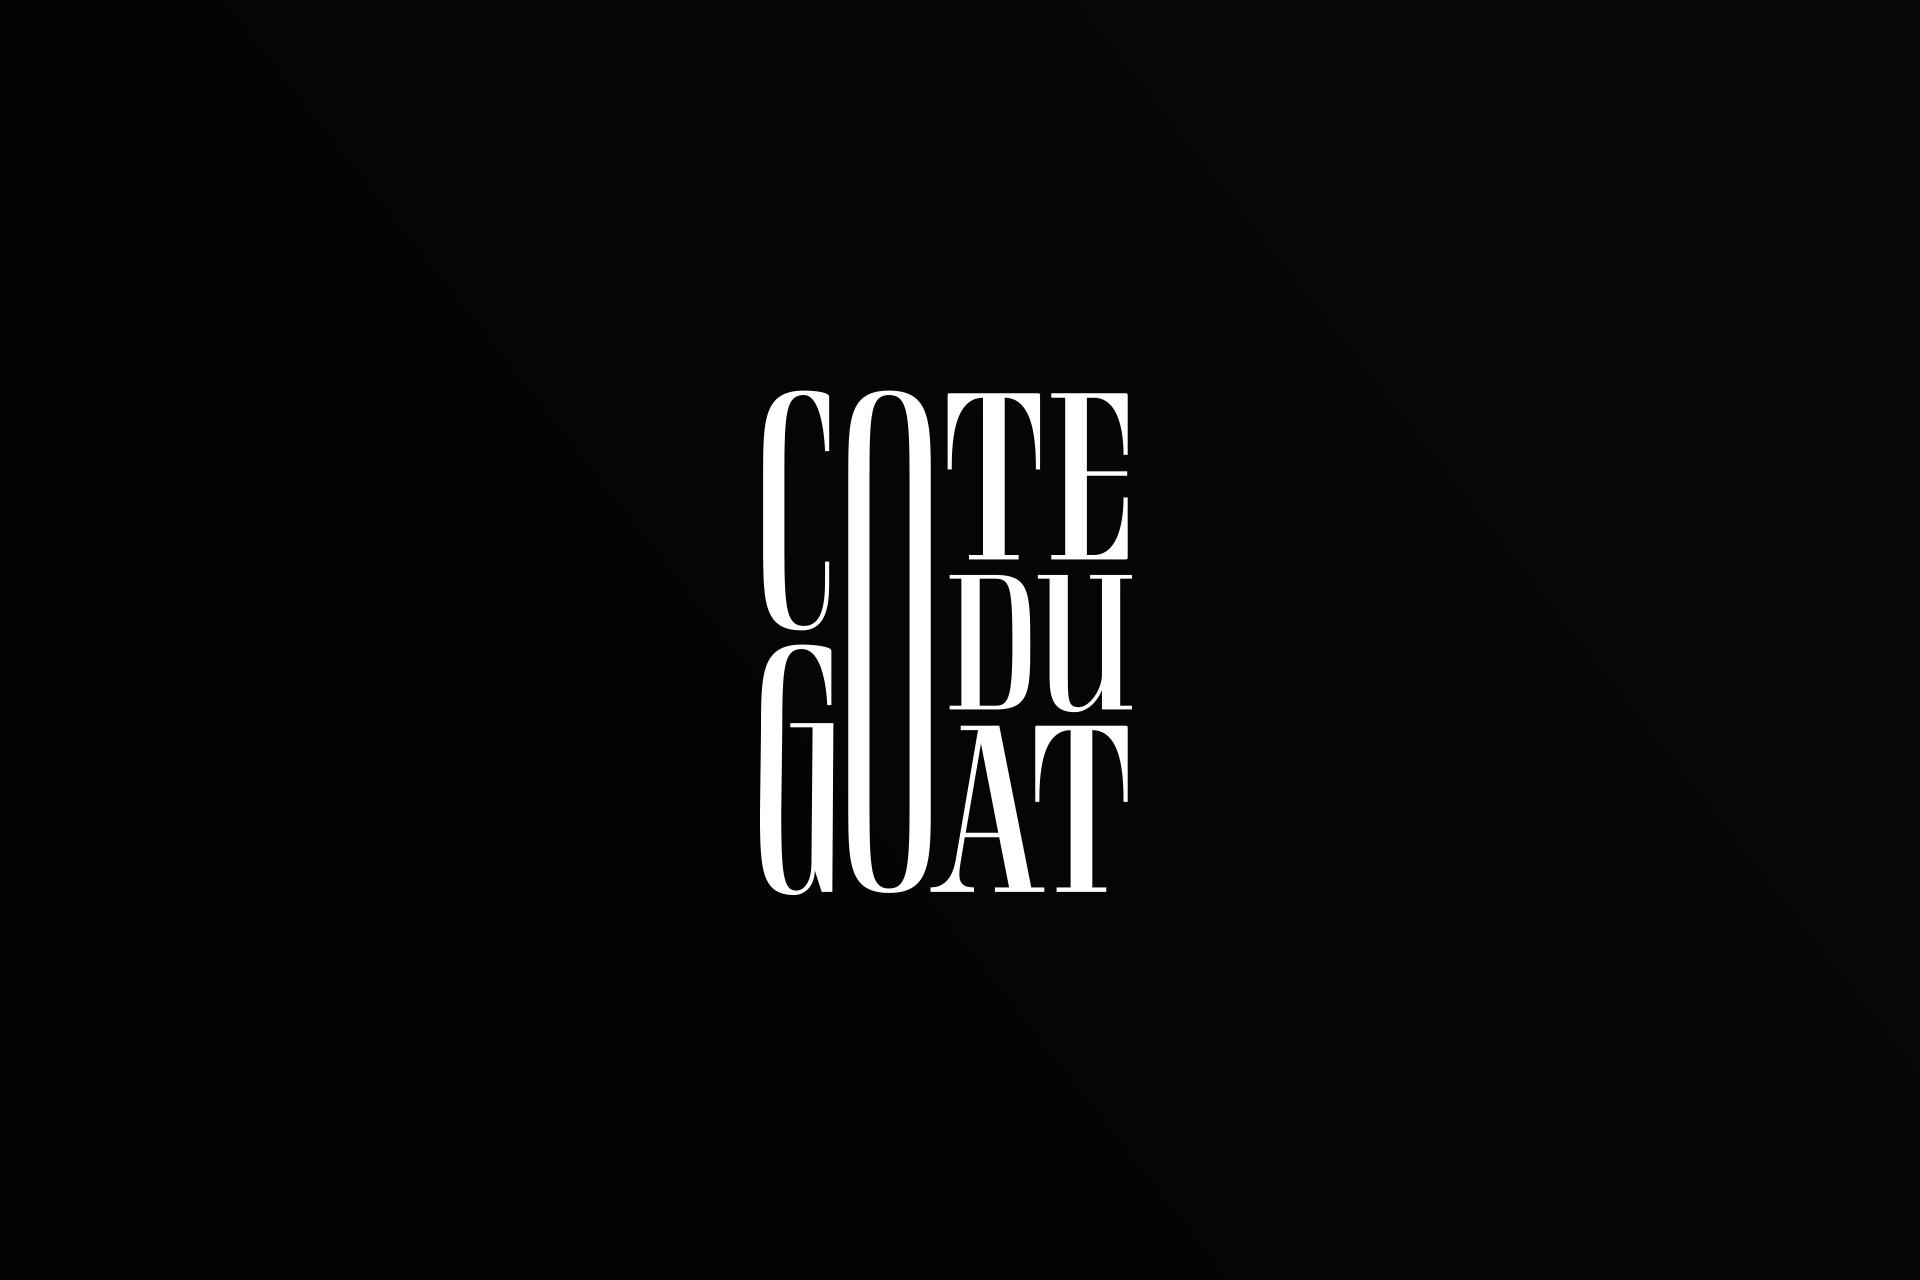 Edgardo Sanchez Logos – Cote du Goat